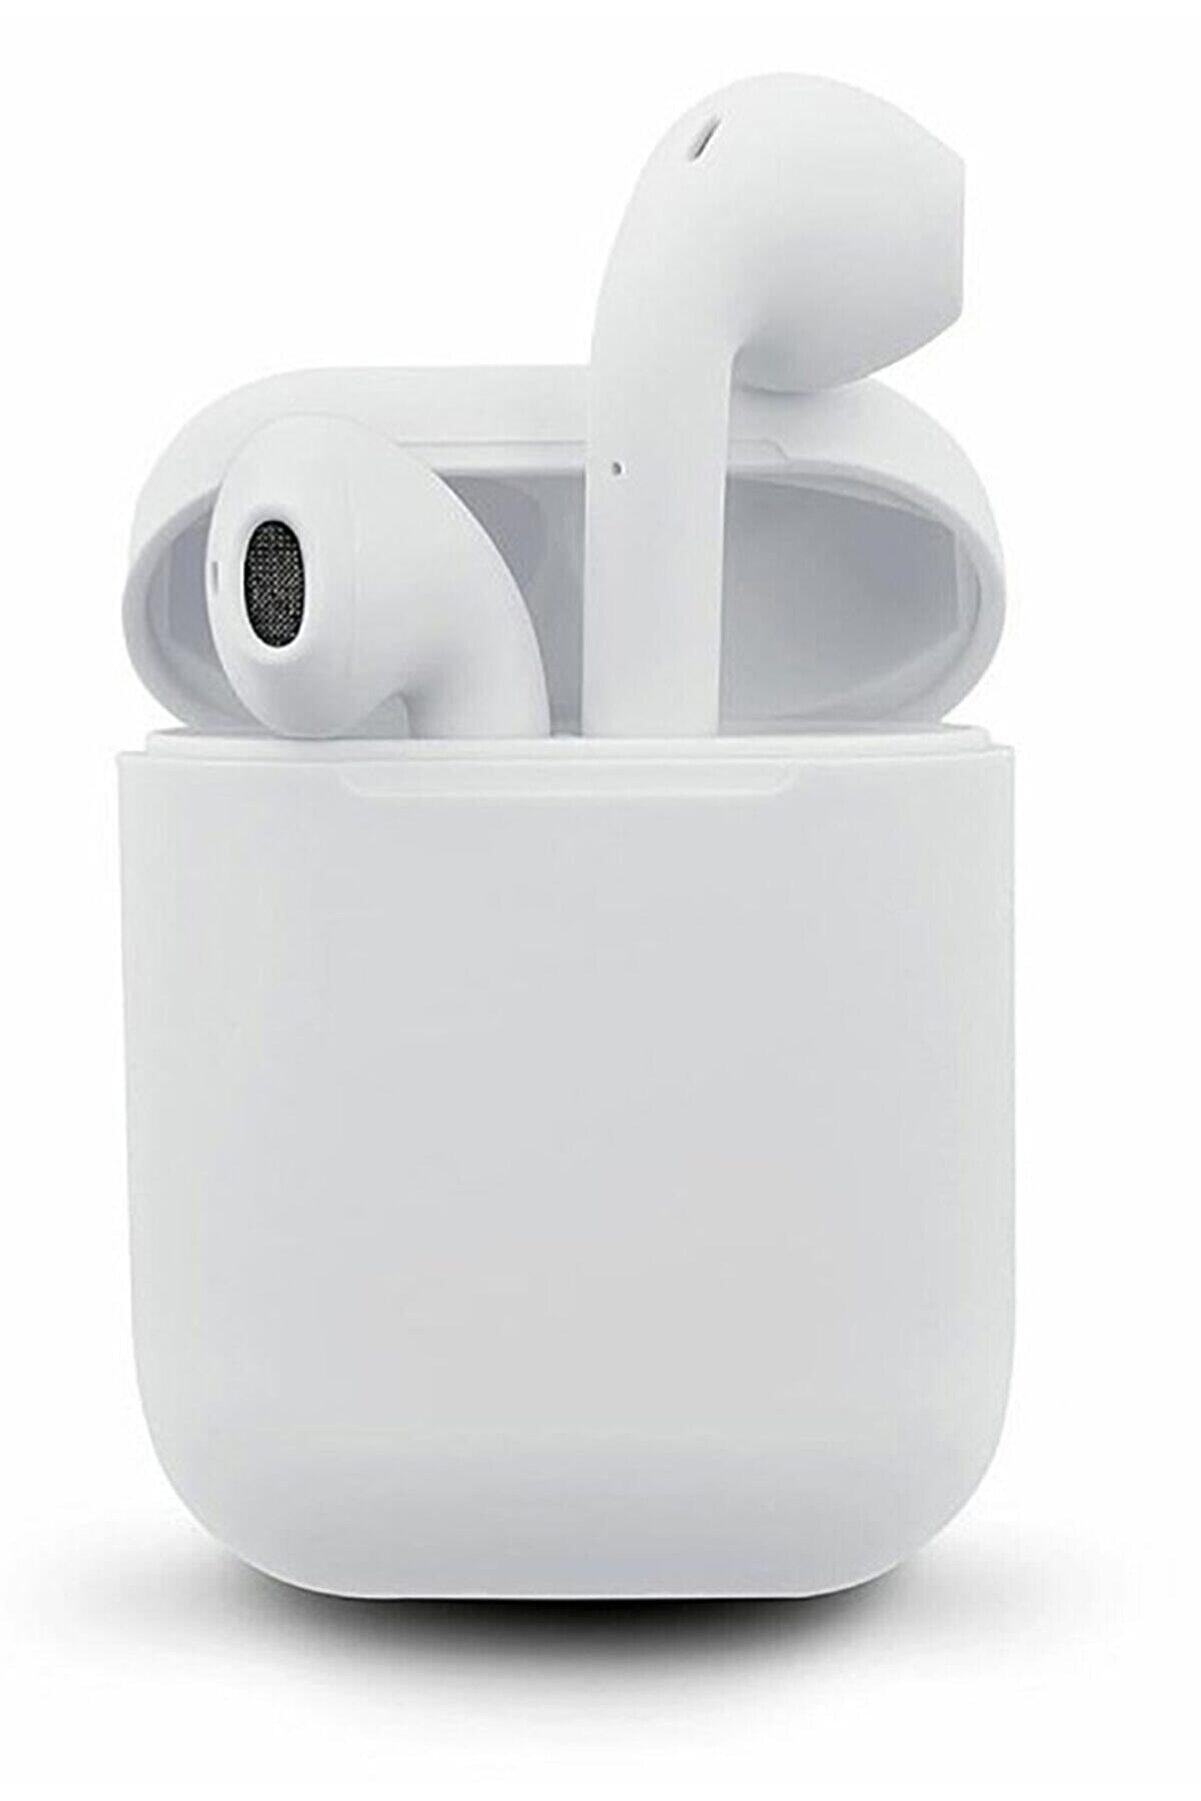 Sarftech I12 Tws Beyaziphone Android Universal Uyumlu Airpods 5.0 Bluetooth Kulaklık